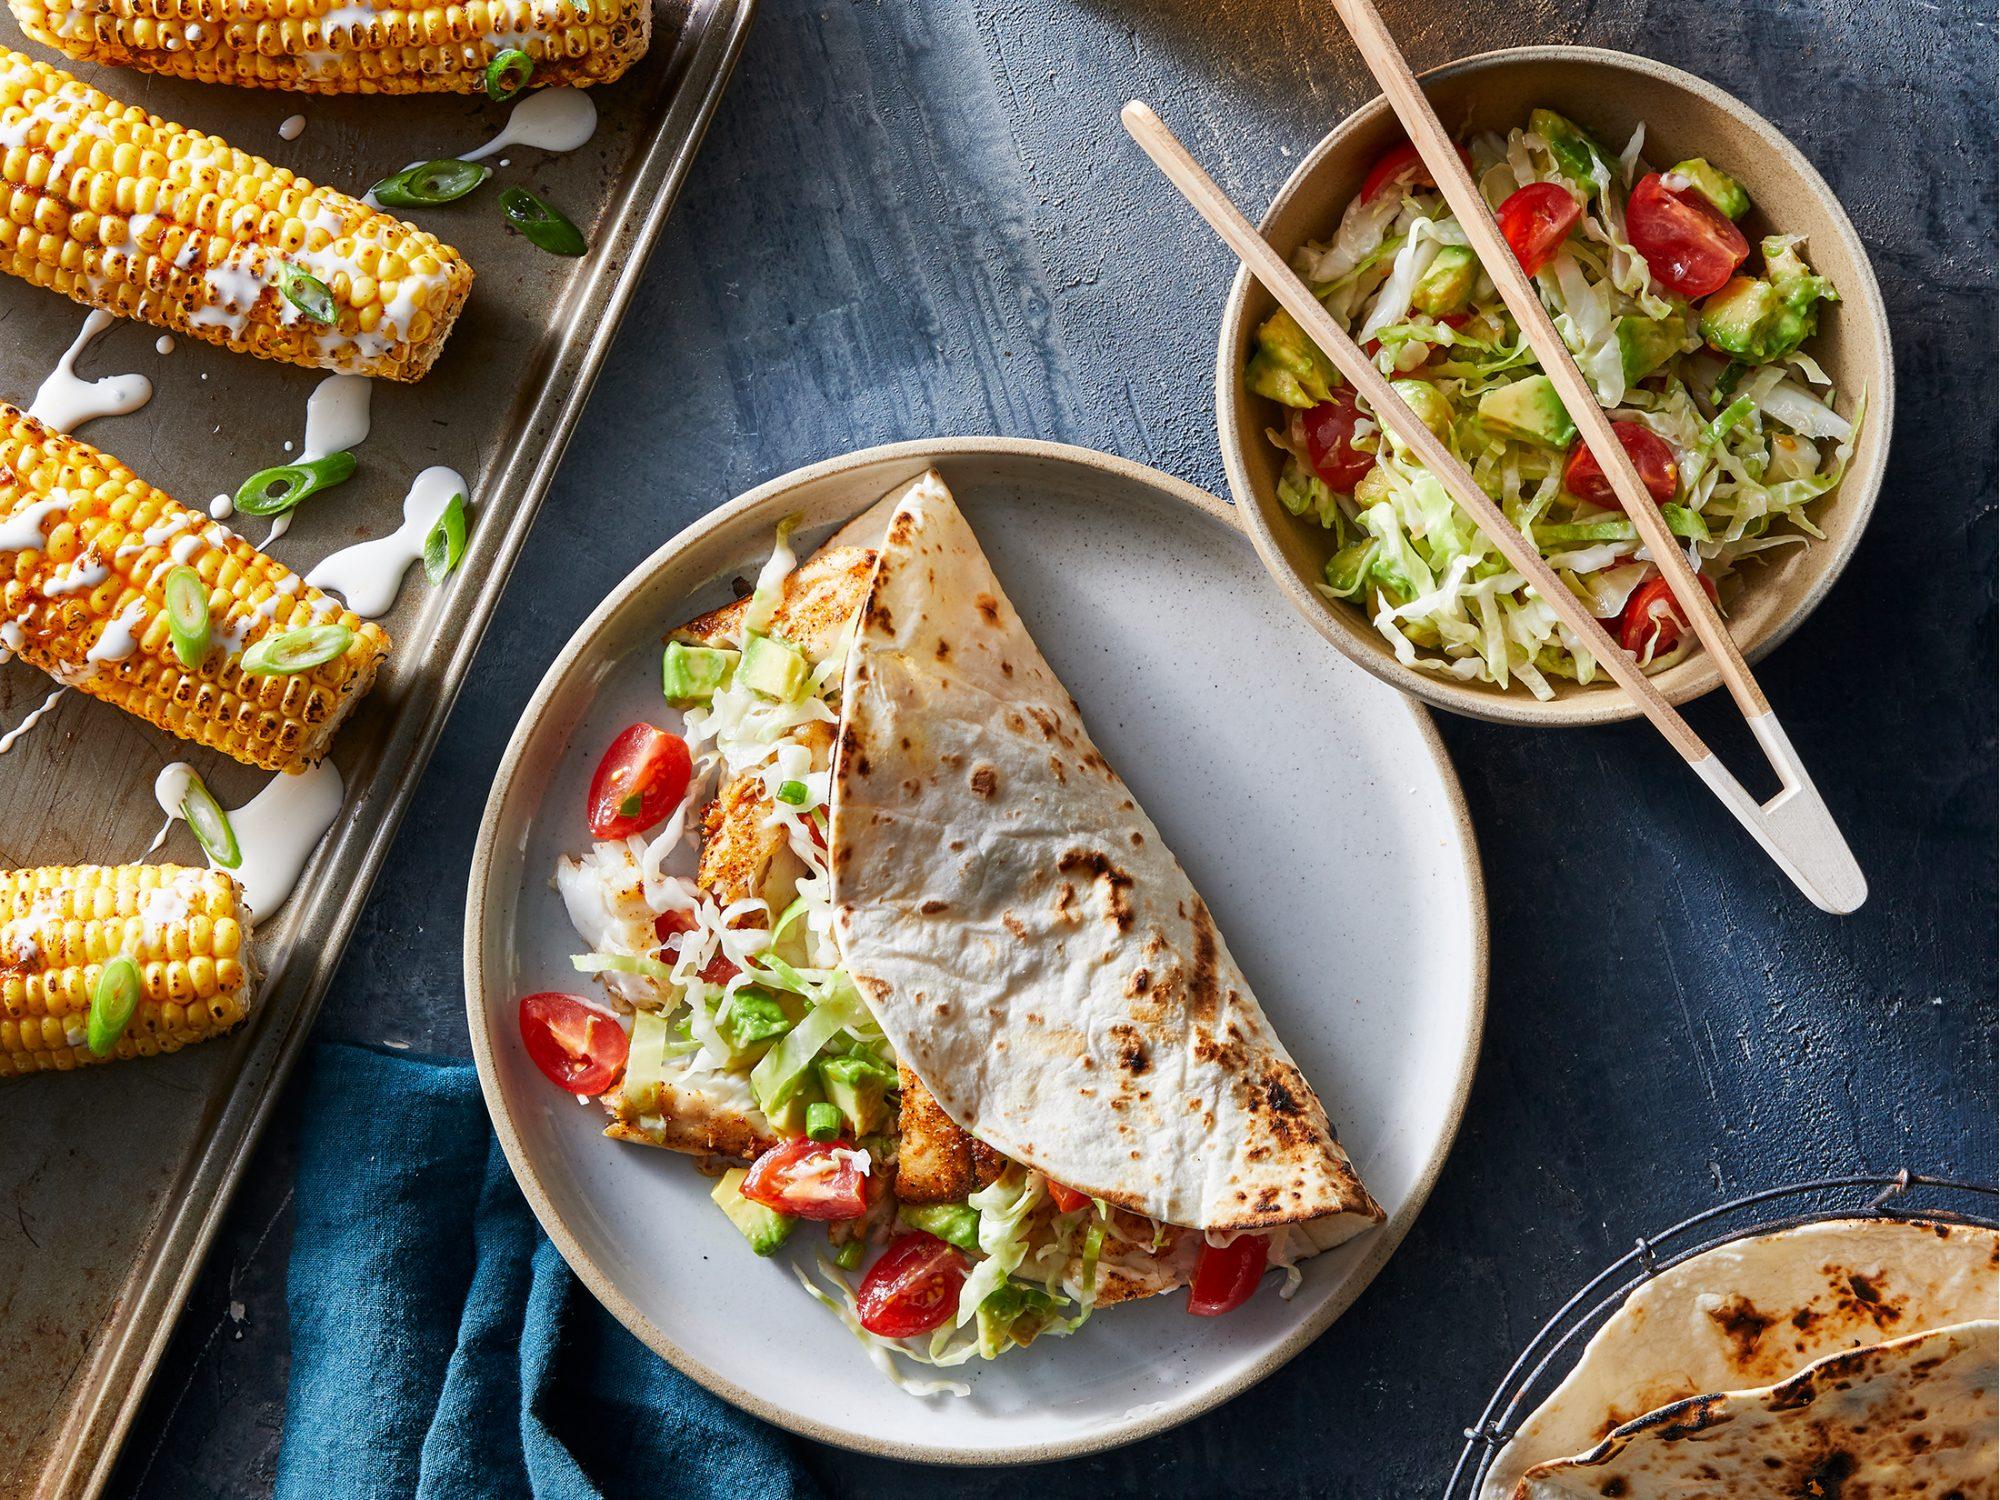 Sheet Pan BBQ Fish Tacos With Mexi Corn image